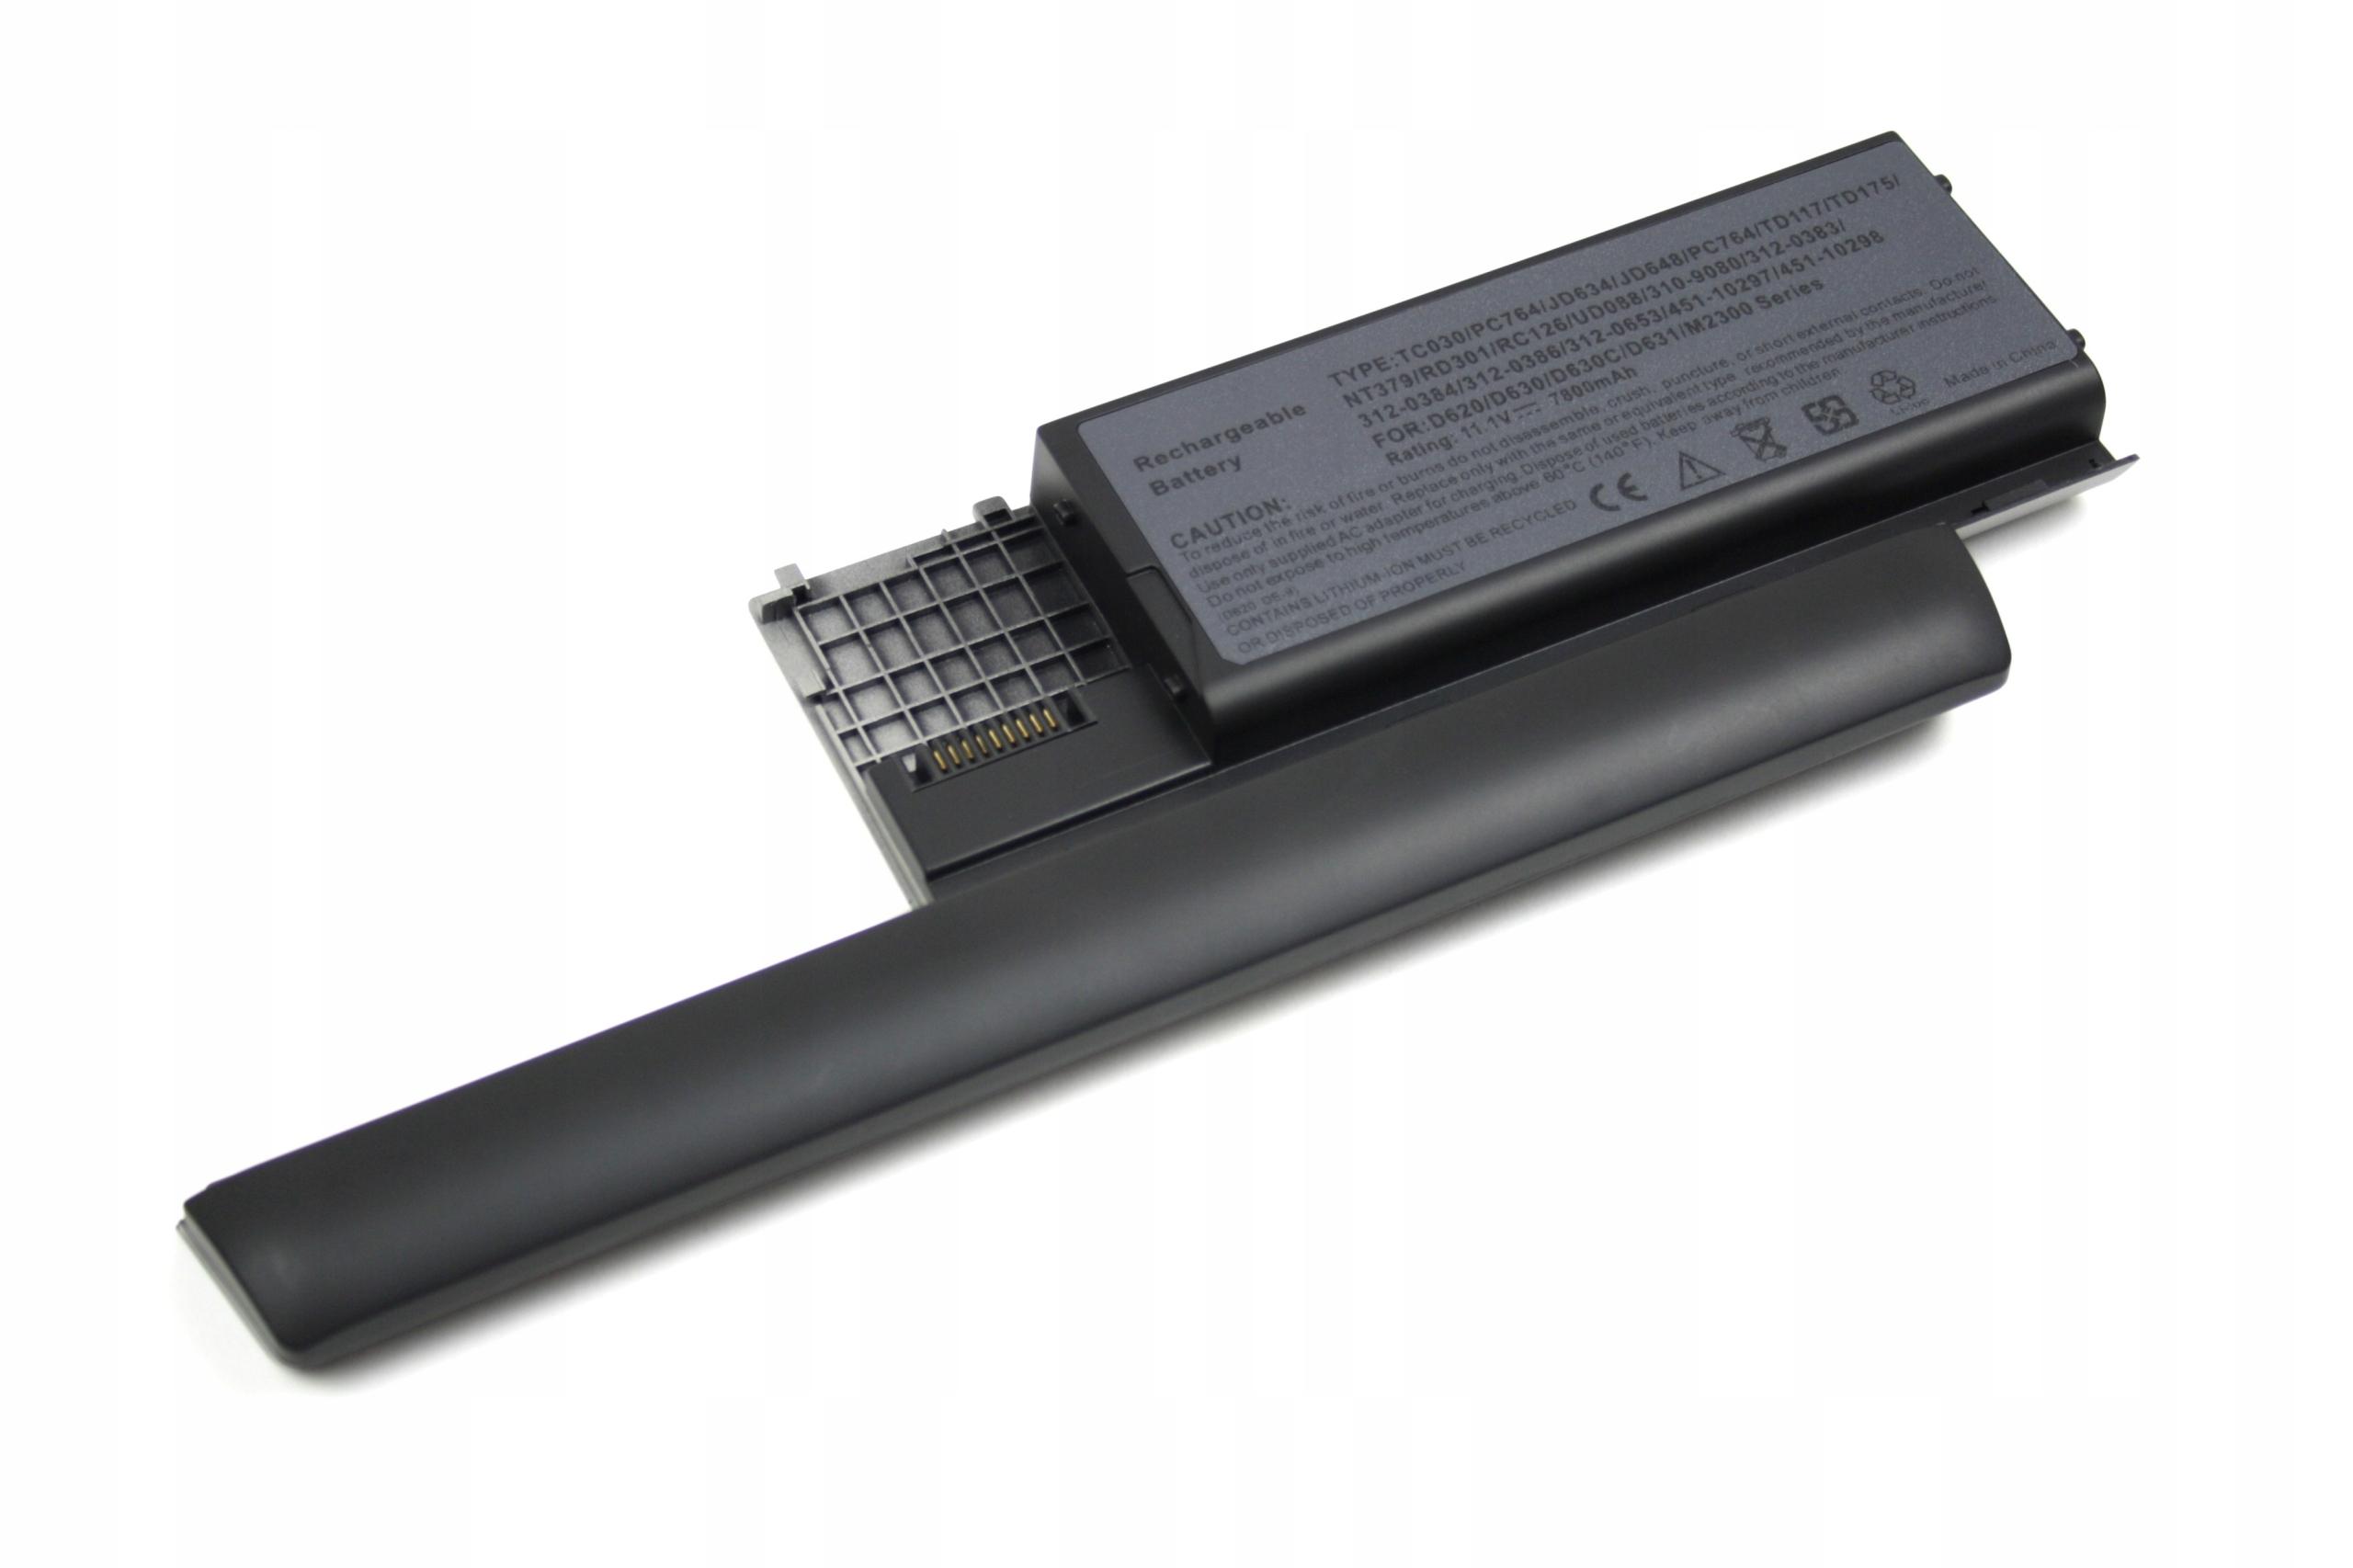 BATERIA AKUMULATOR DELL LATITUDE D620 D630 D631 PC764 - Baterie do laptopów